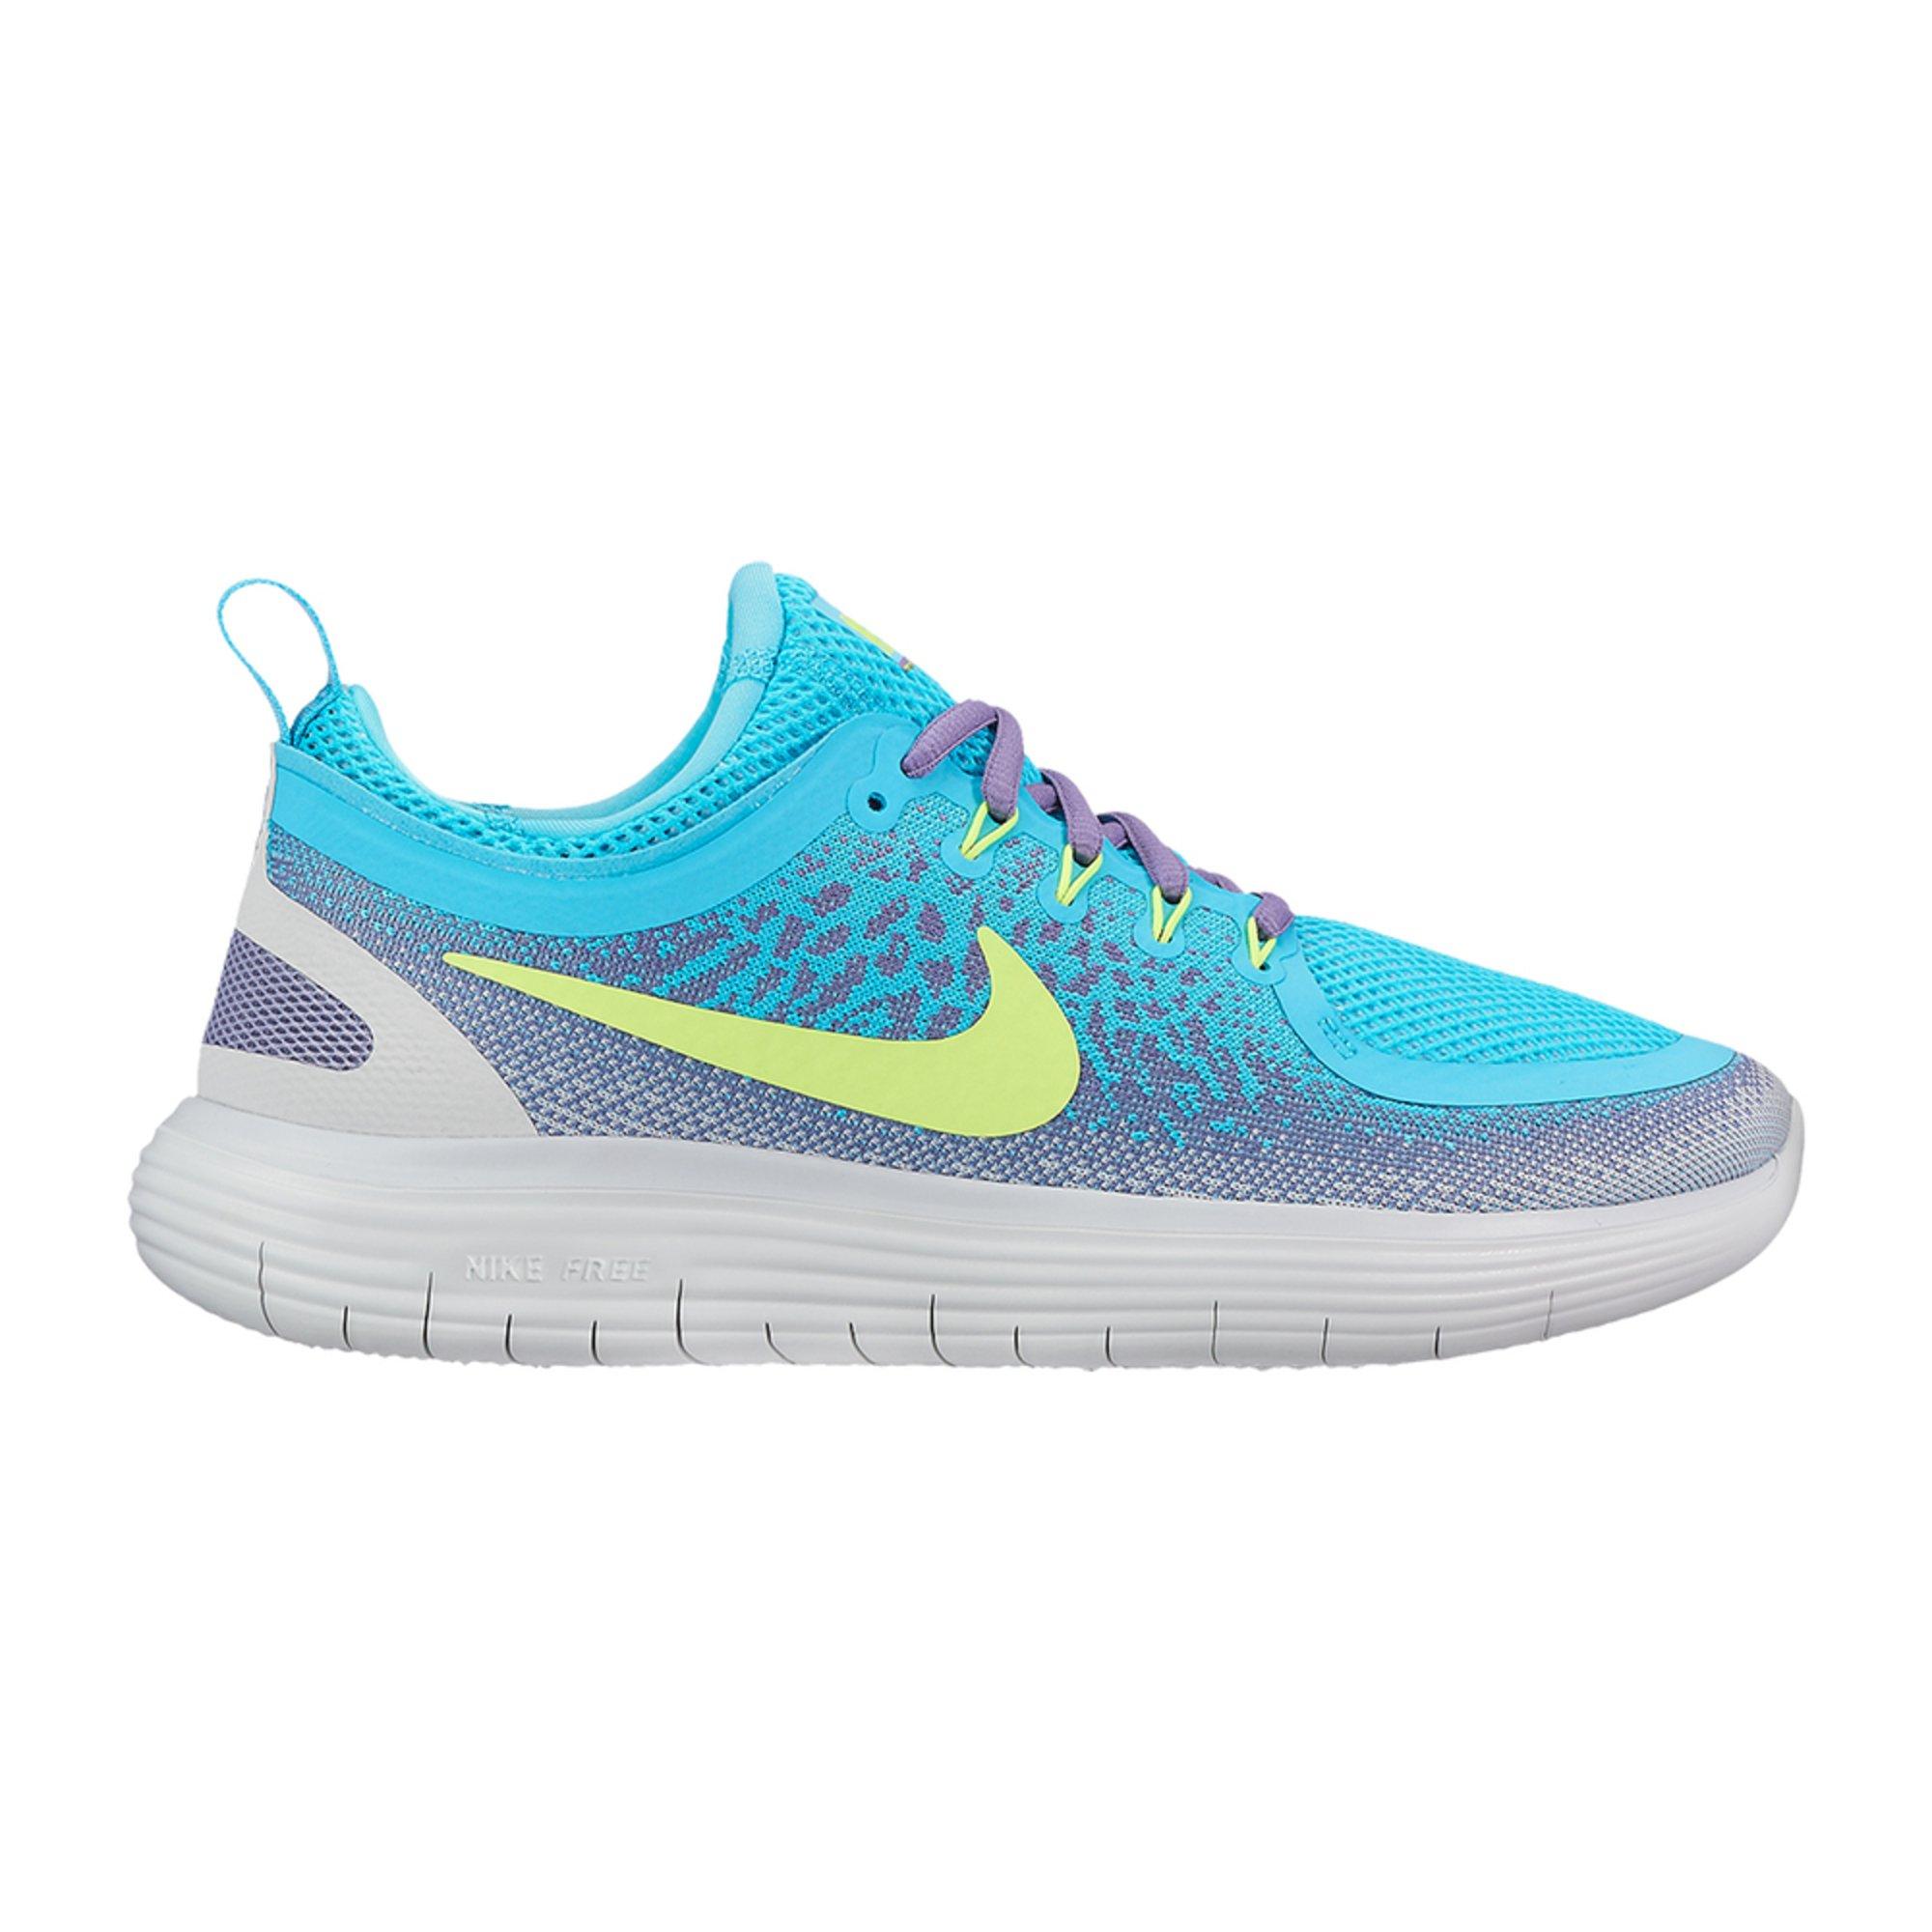 Nike Free Run 6 0 Avis Blu